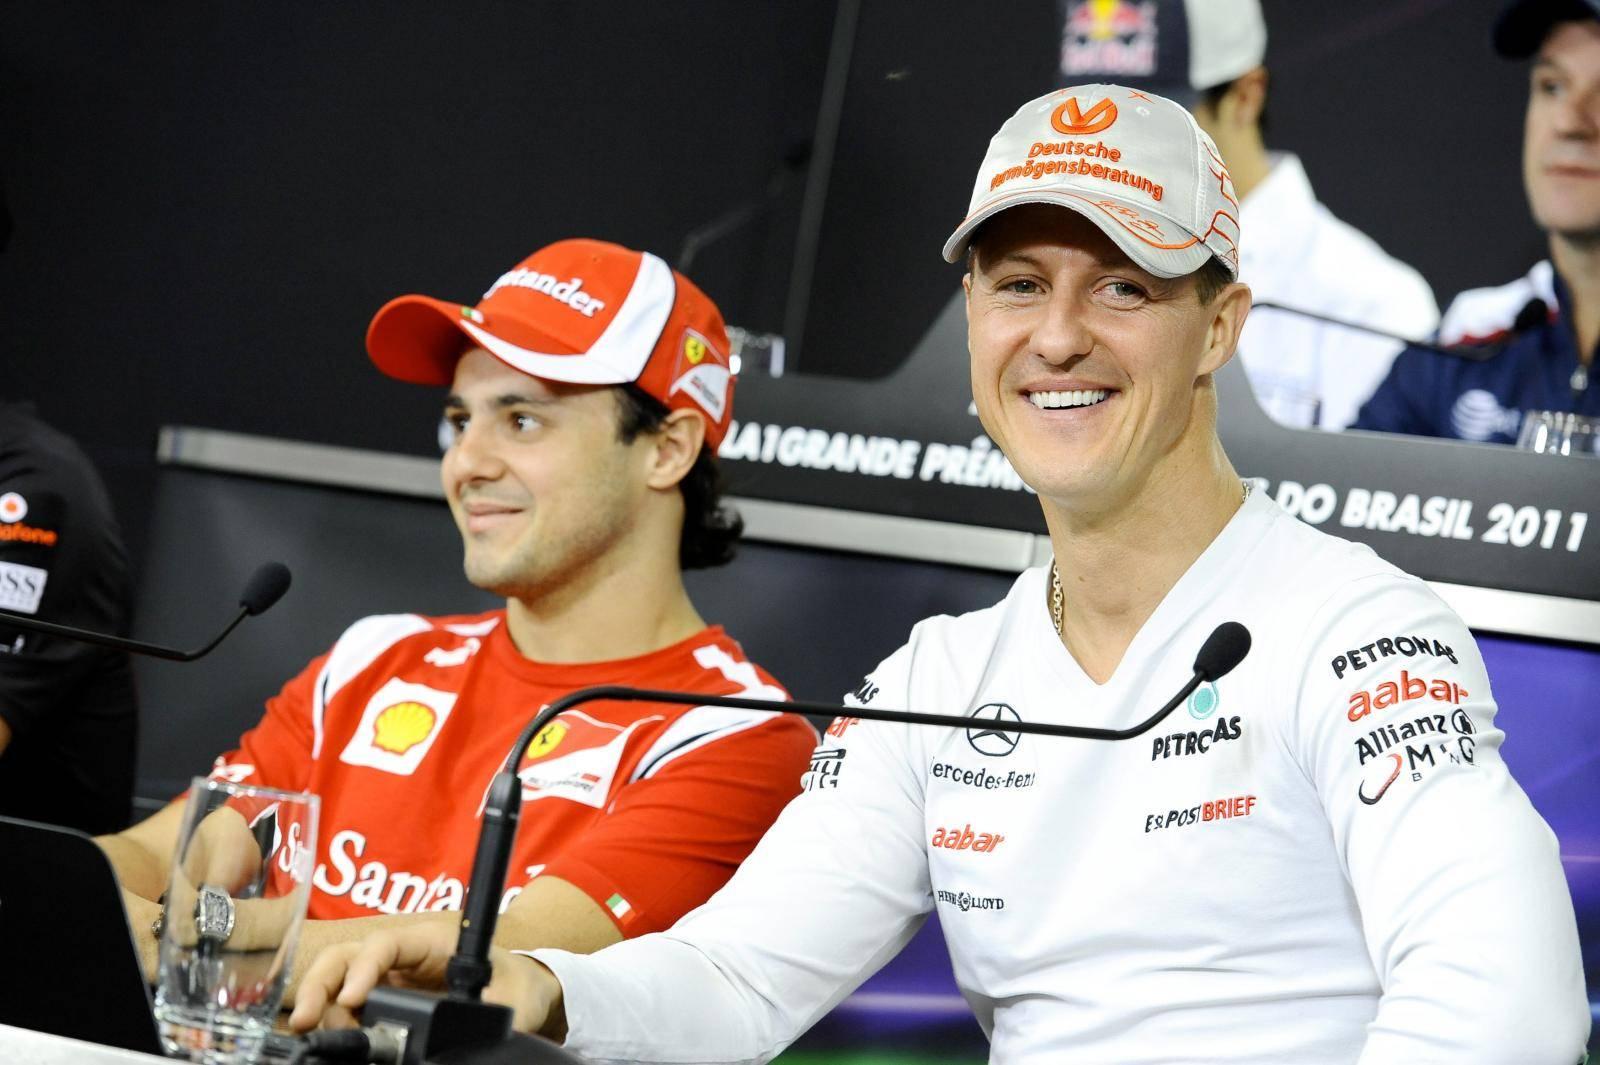 BRA, F1, Grosser Preis von Brasilien, S‹o Paulo